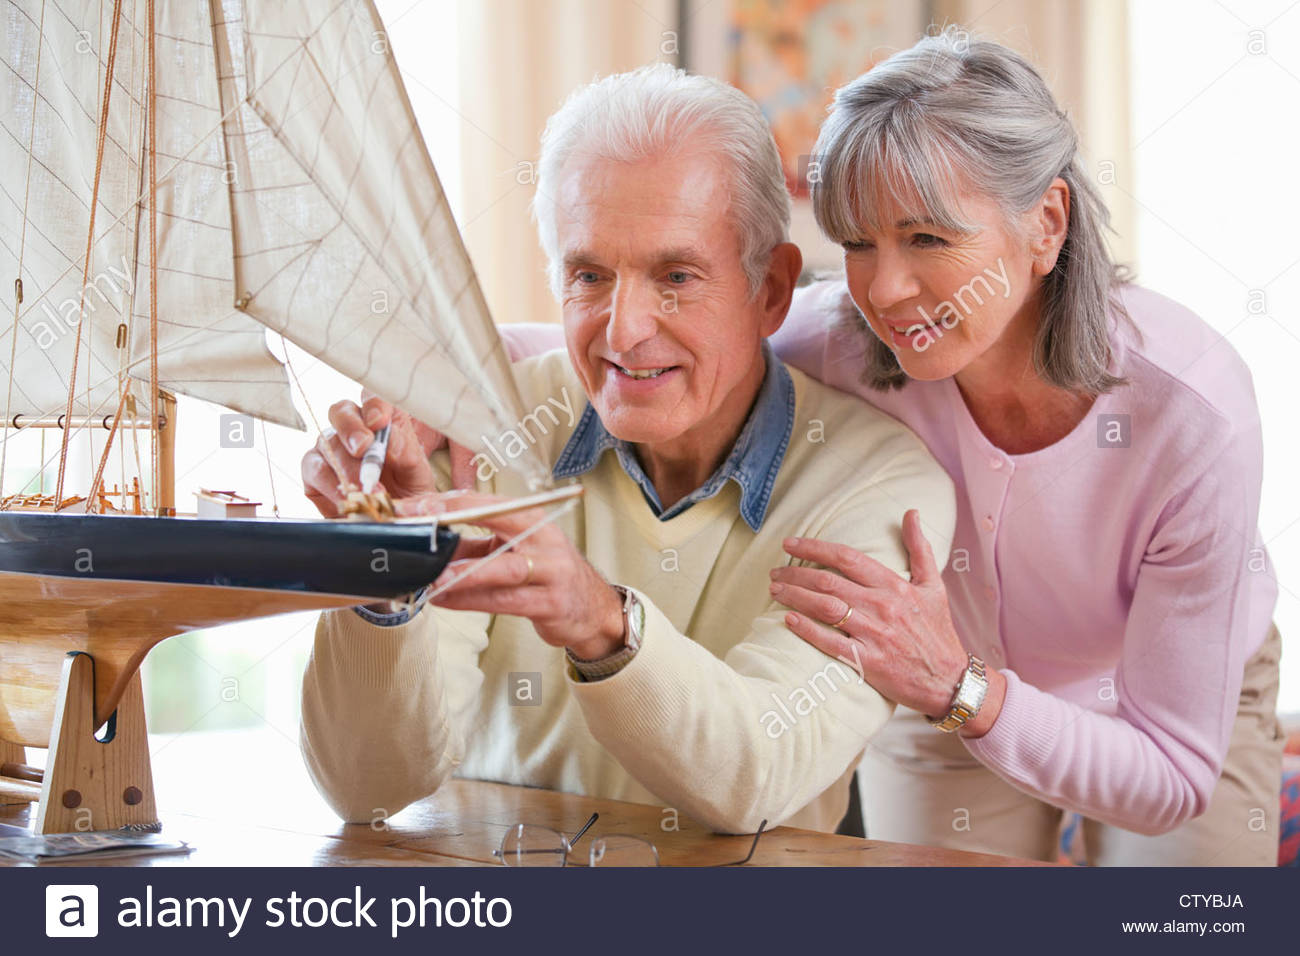 Senior woman watching senior man apply glue to model sailboat Stock Photo